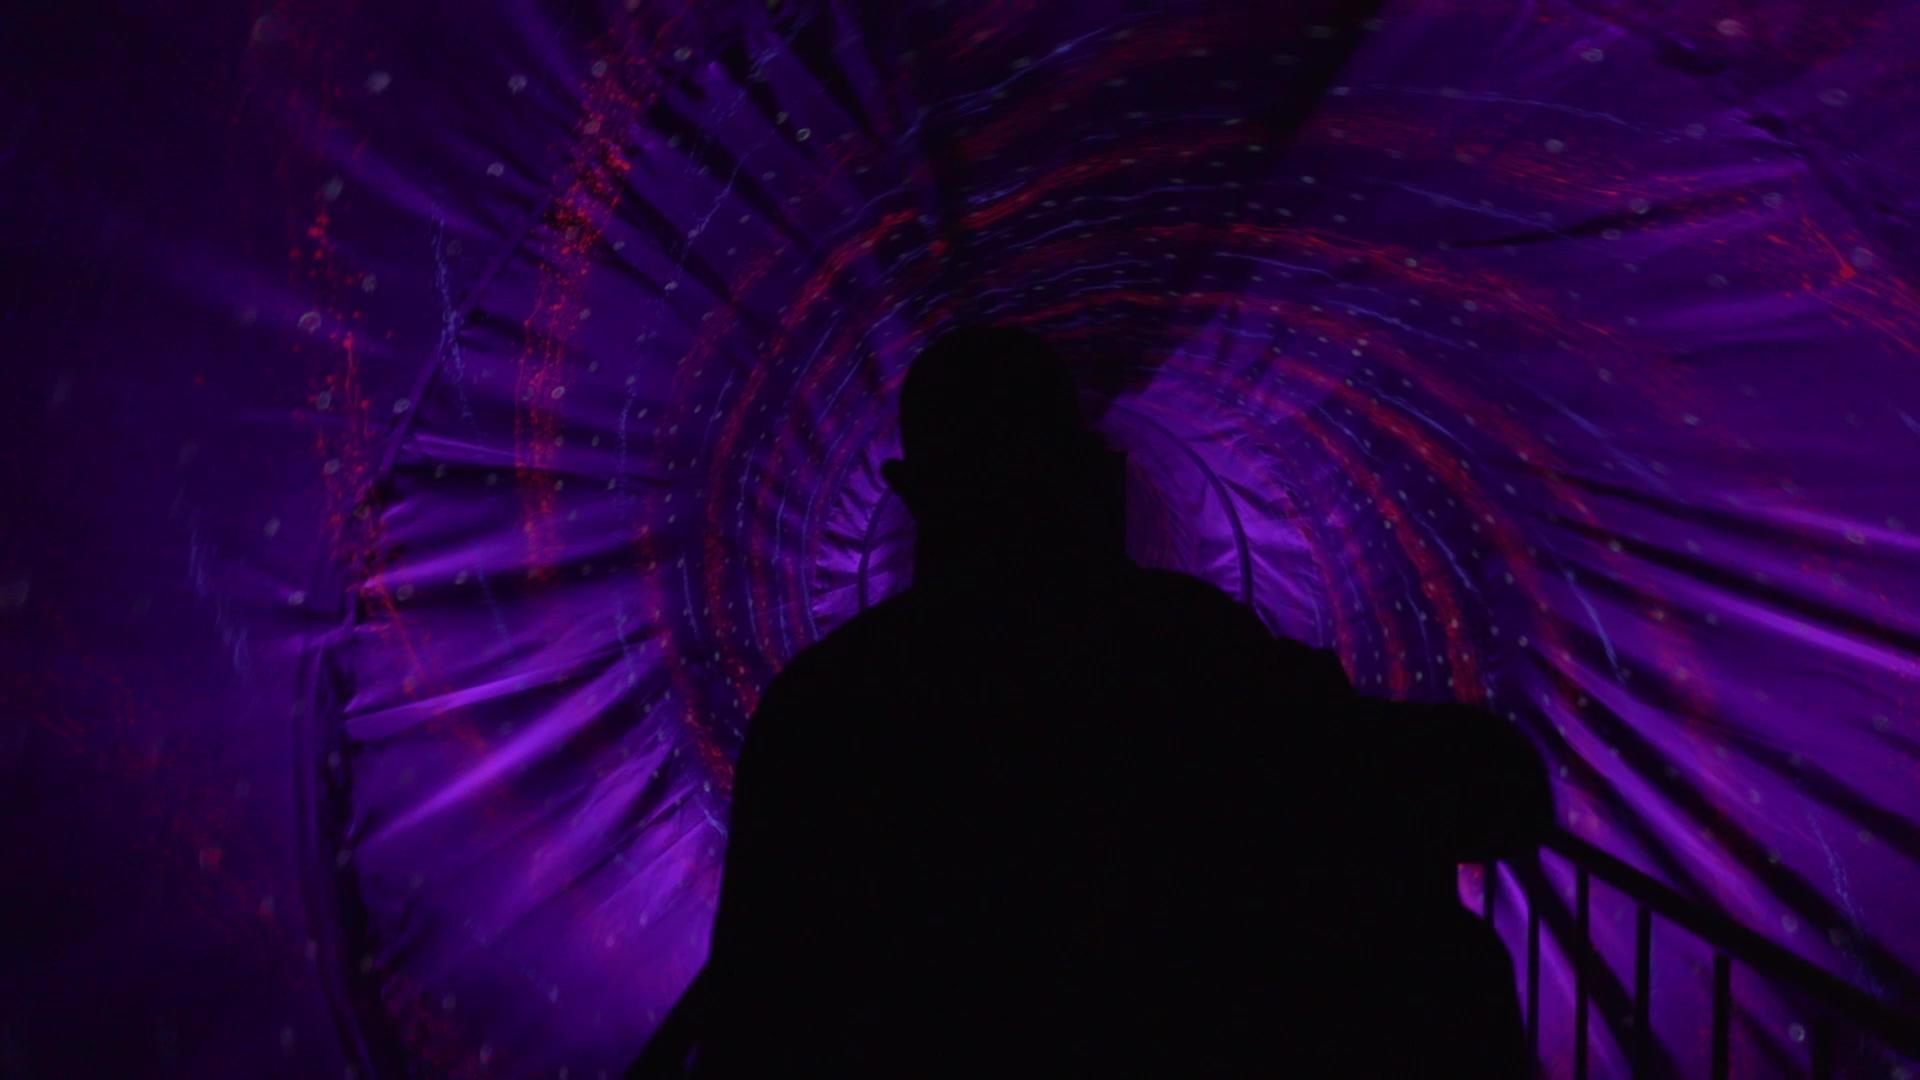 ChronicPalooza 21 Highligh video final